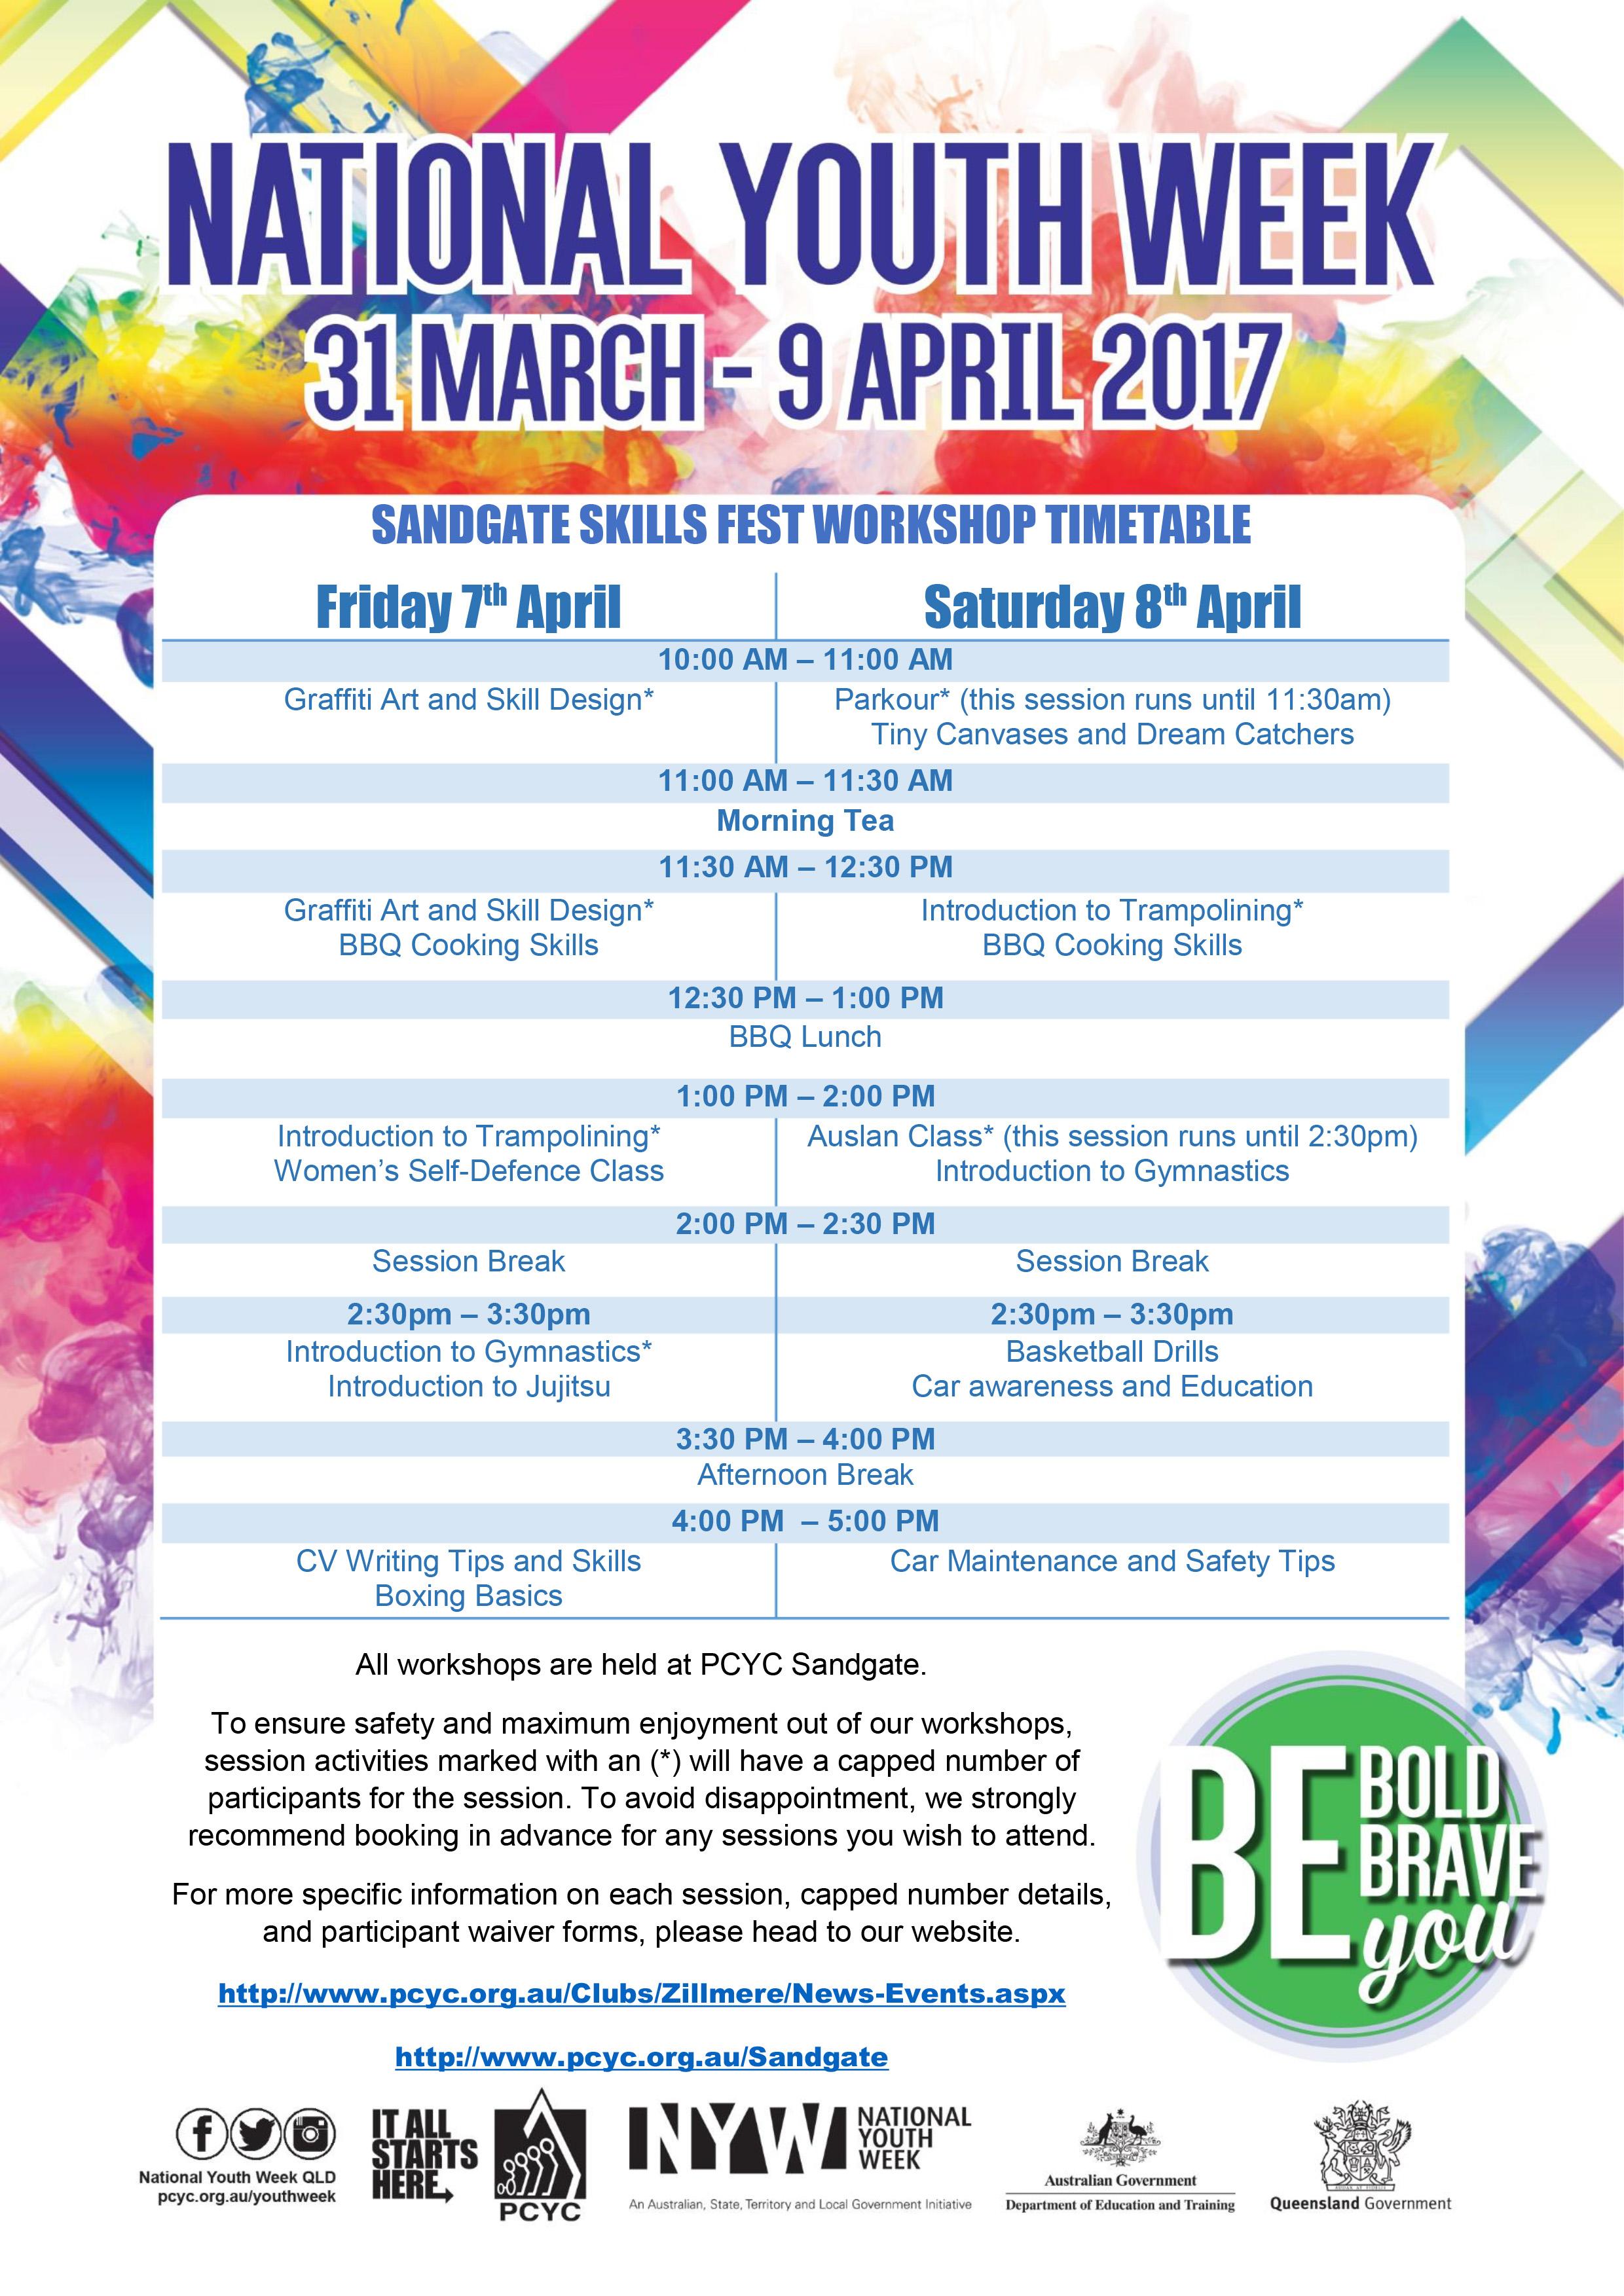 Sandgate-Skills-Fest-2017-Timetable.jpg?